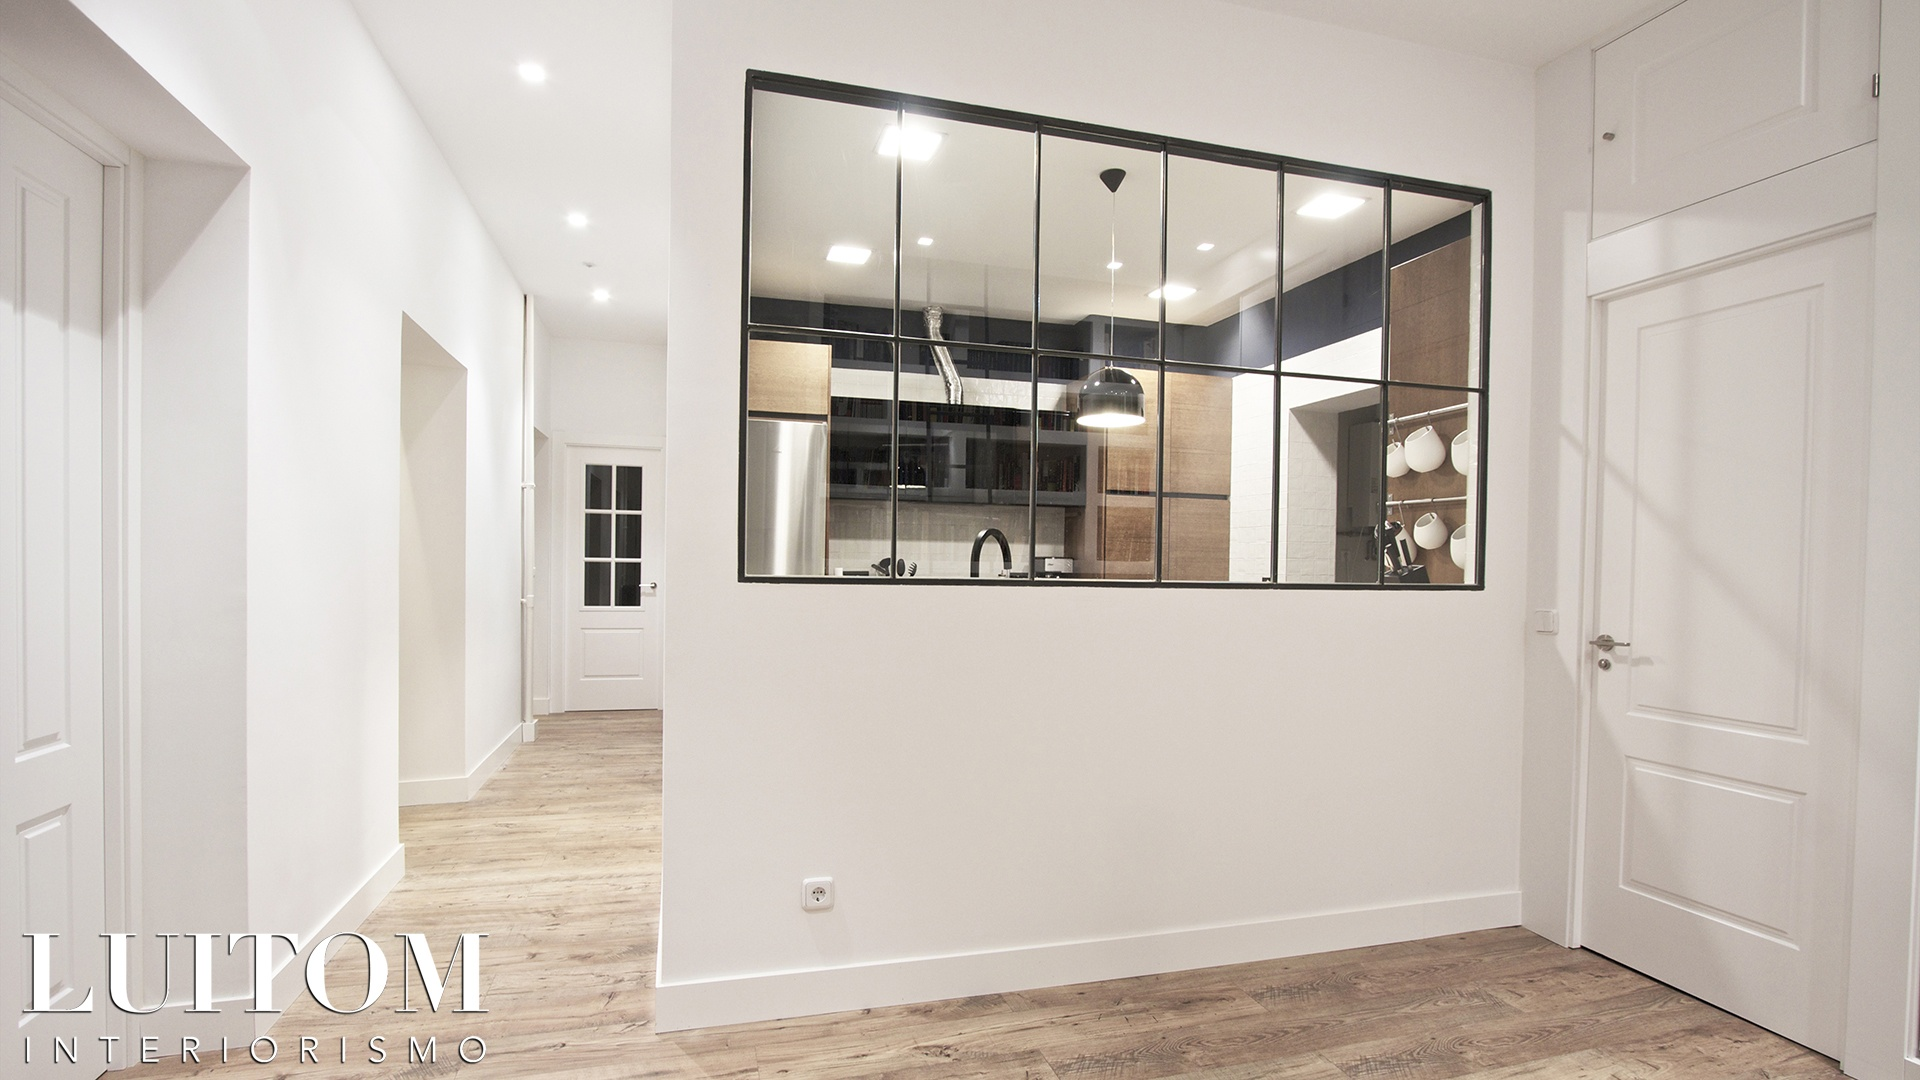 cristaleras-cocinas-pared-cristal-separacion-cocina-salon-cristalera-metalica-madera-blanca-negra-11